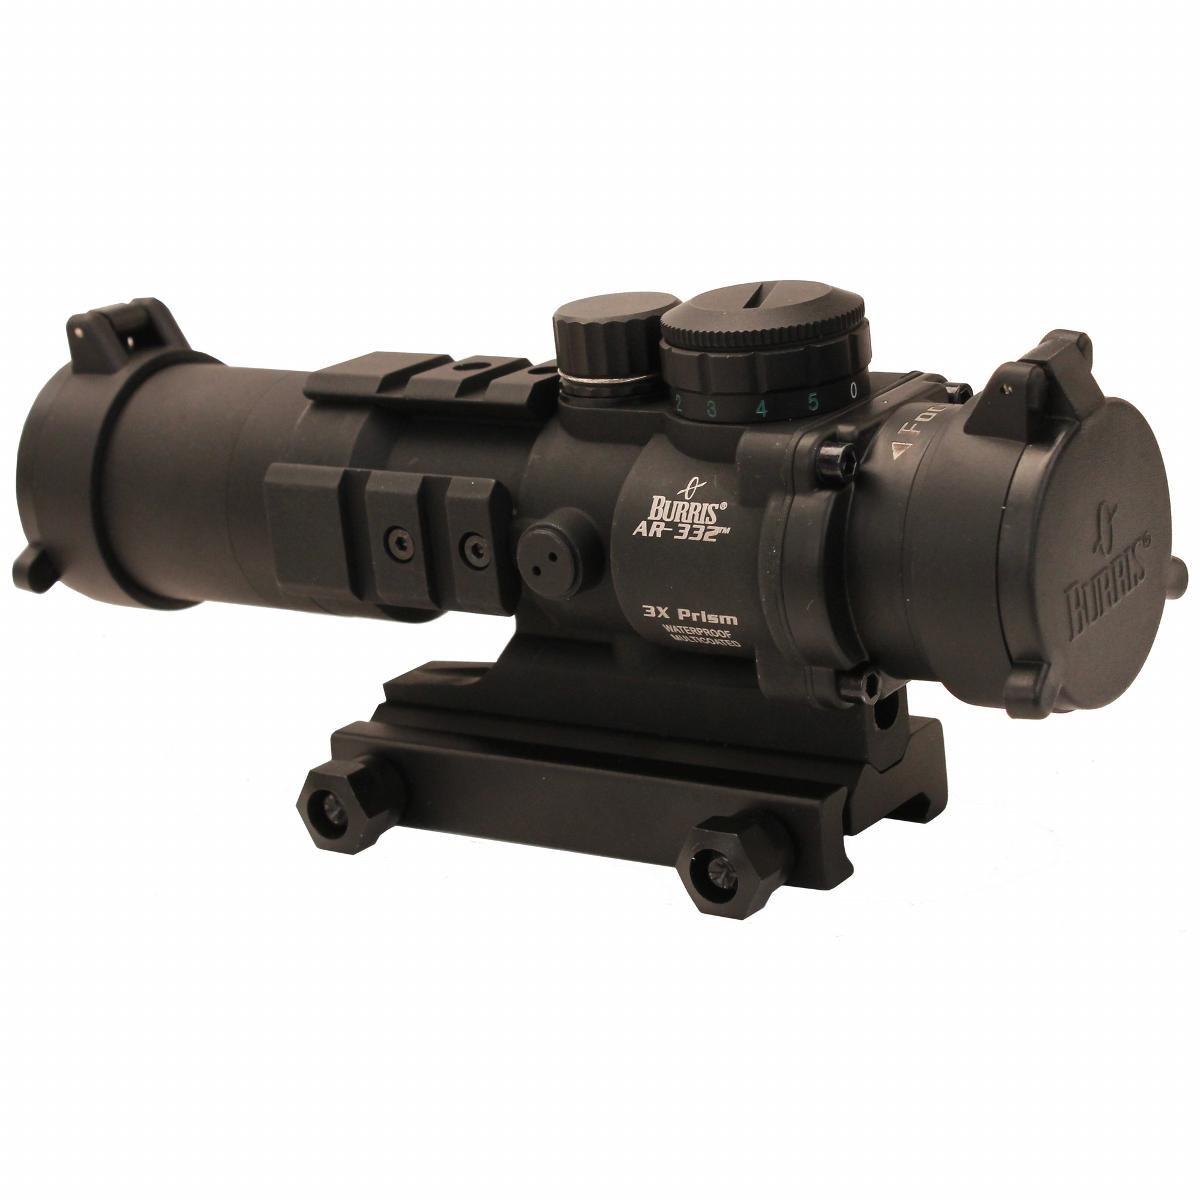 spitfire ar prism scope. amazon.com : burris 300208 ar-332 3x32 prism sight (black) gun scopes sports \u0026 outdoors spitfire ar scope